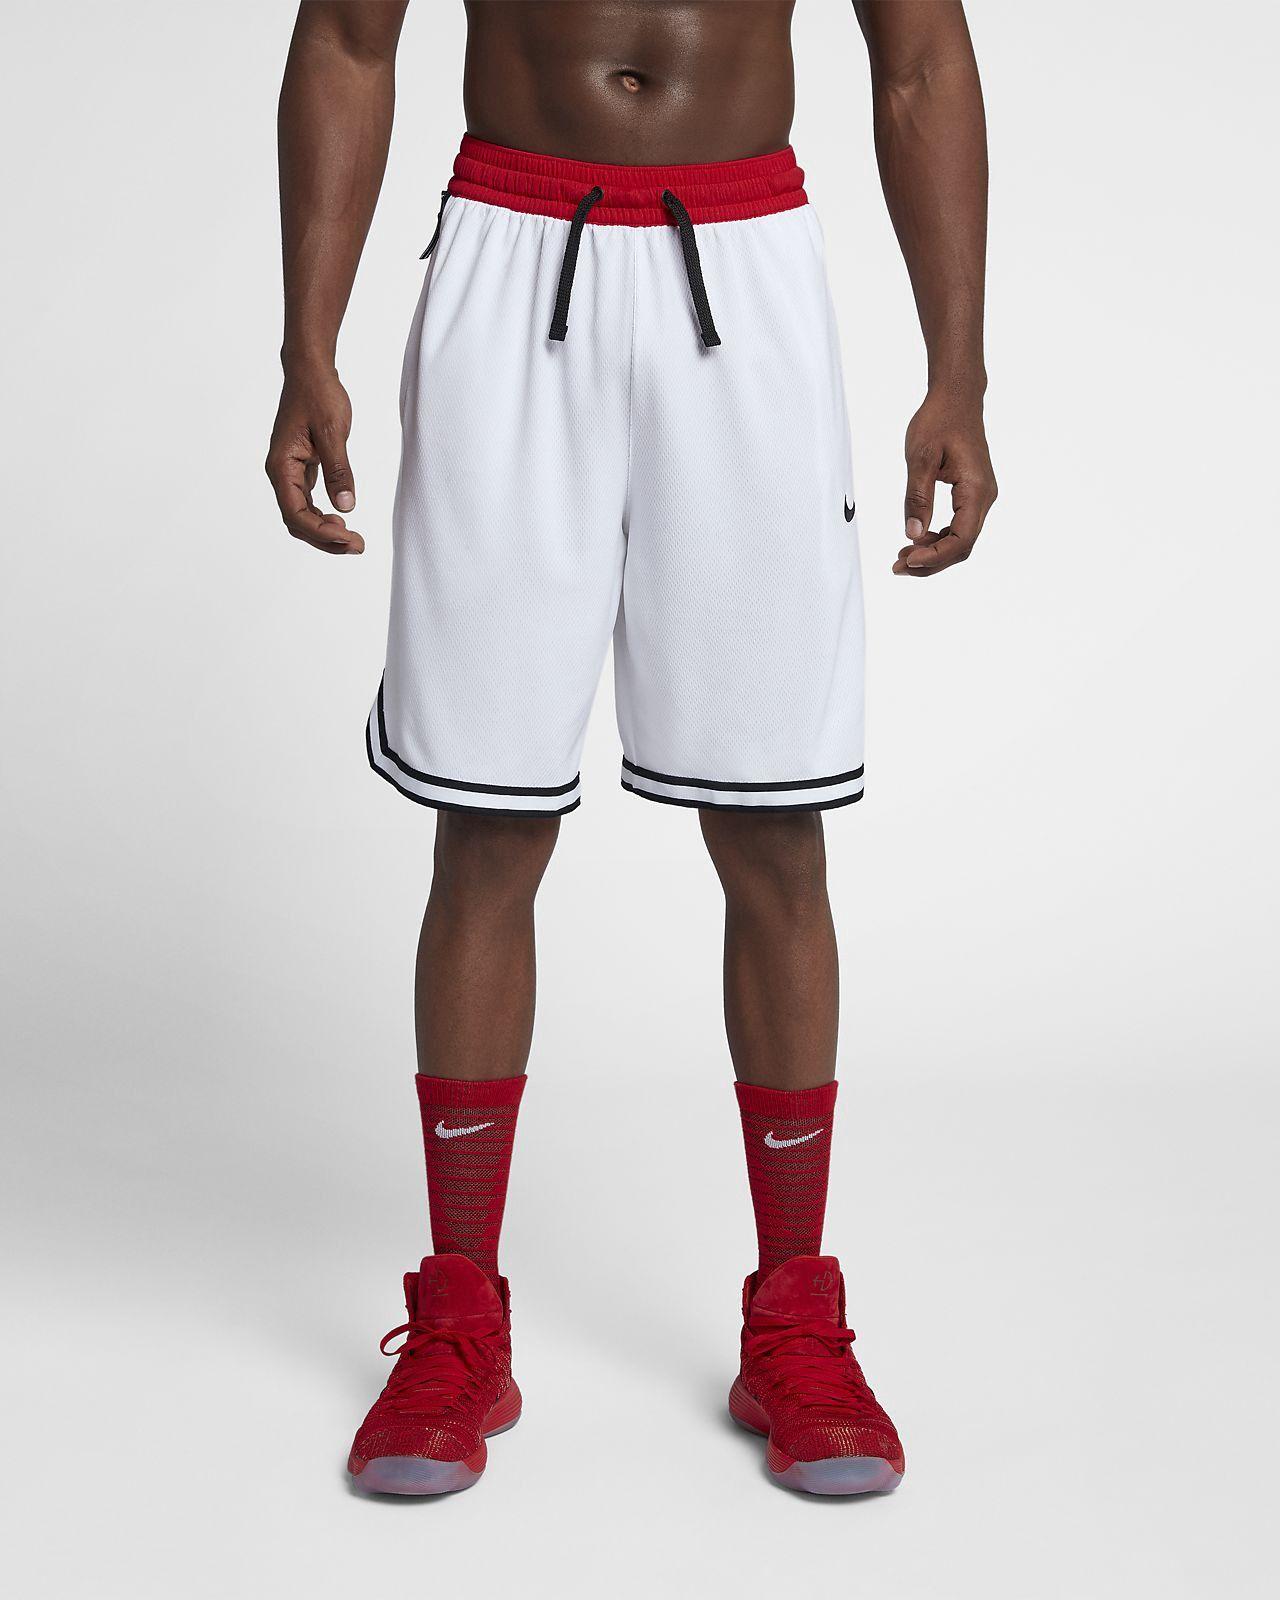 Nike Dri Fit Dna Men's Basketball Shorts S